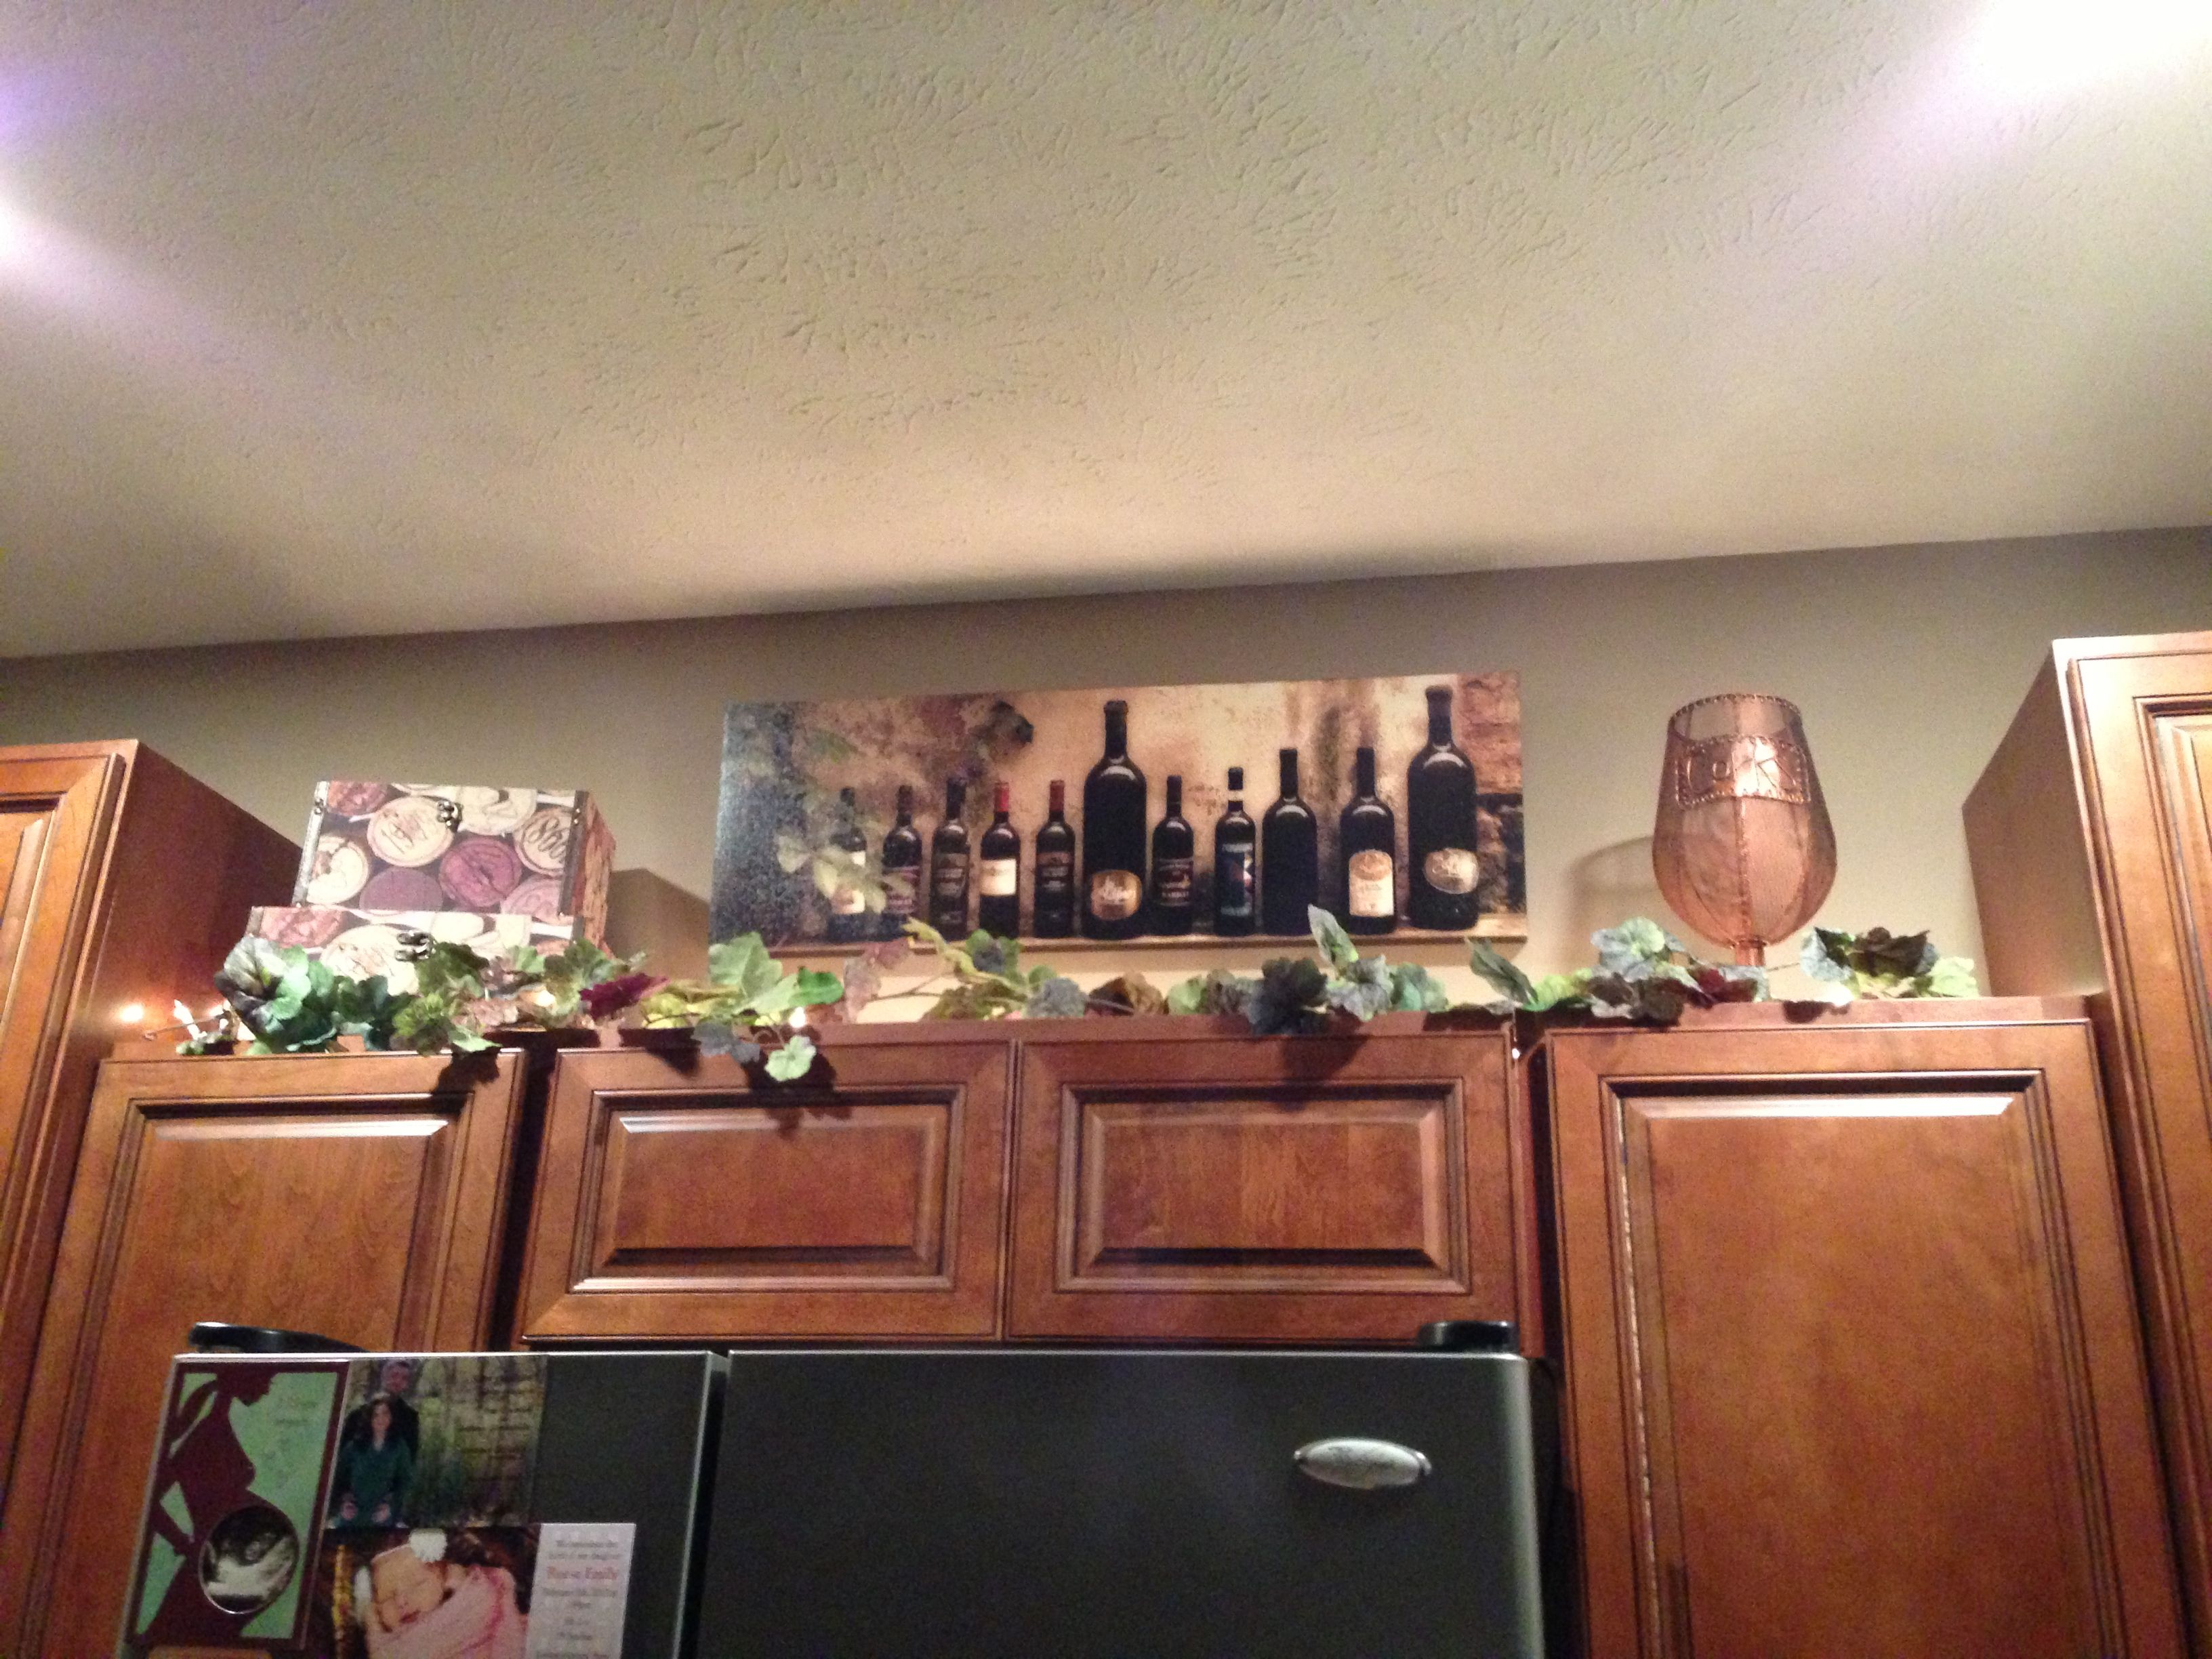 vineyard kitchen decor door repair wine cabinet decorations home ideas